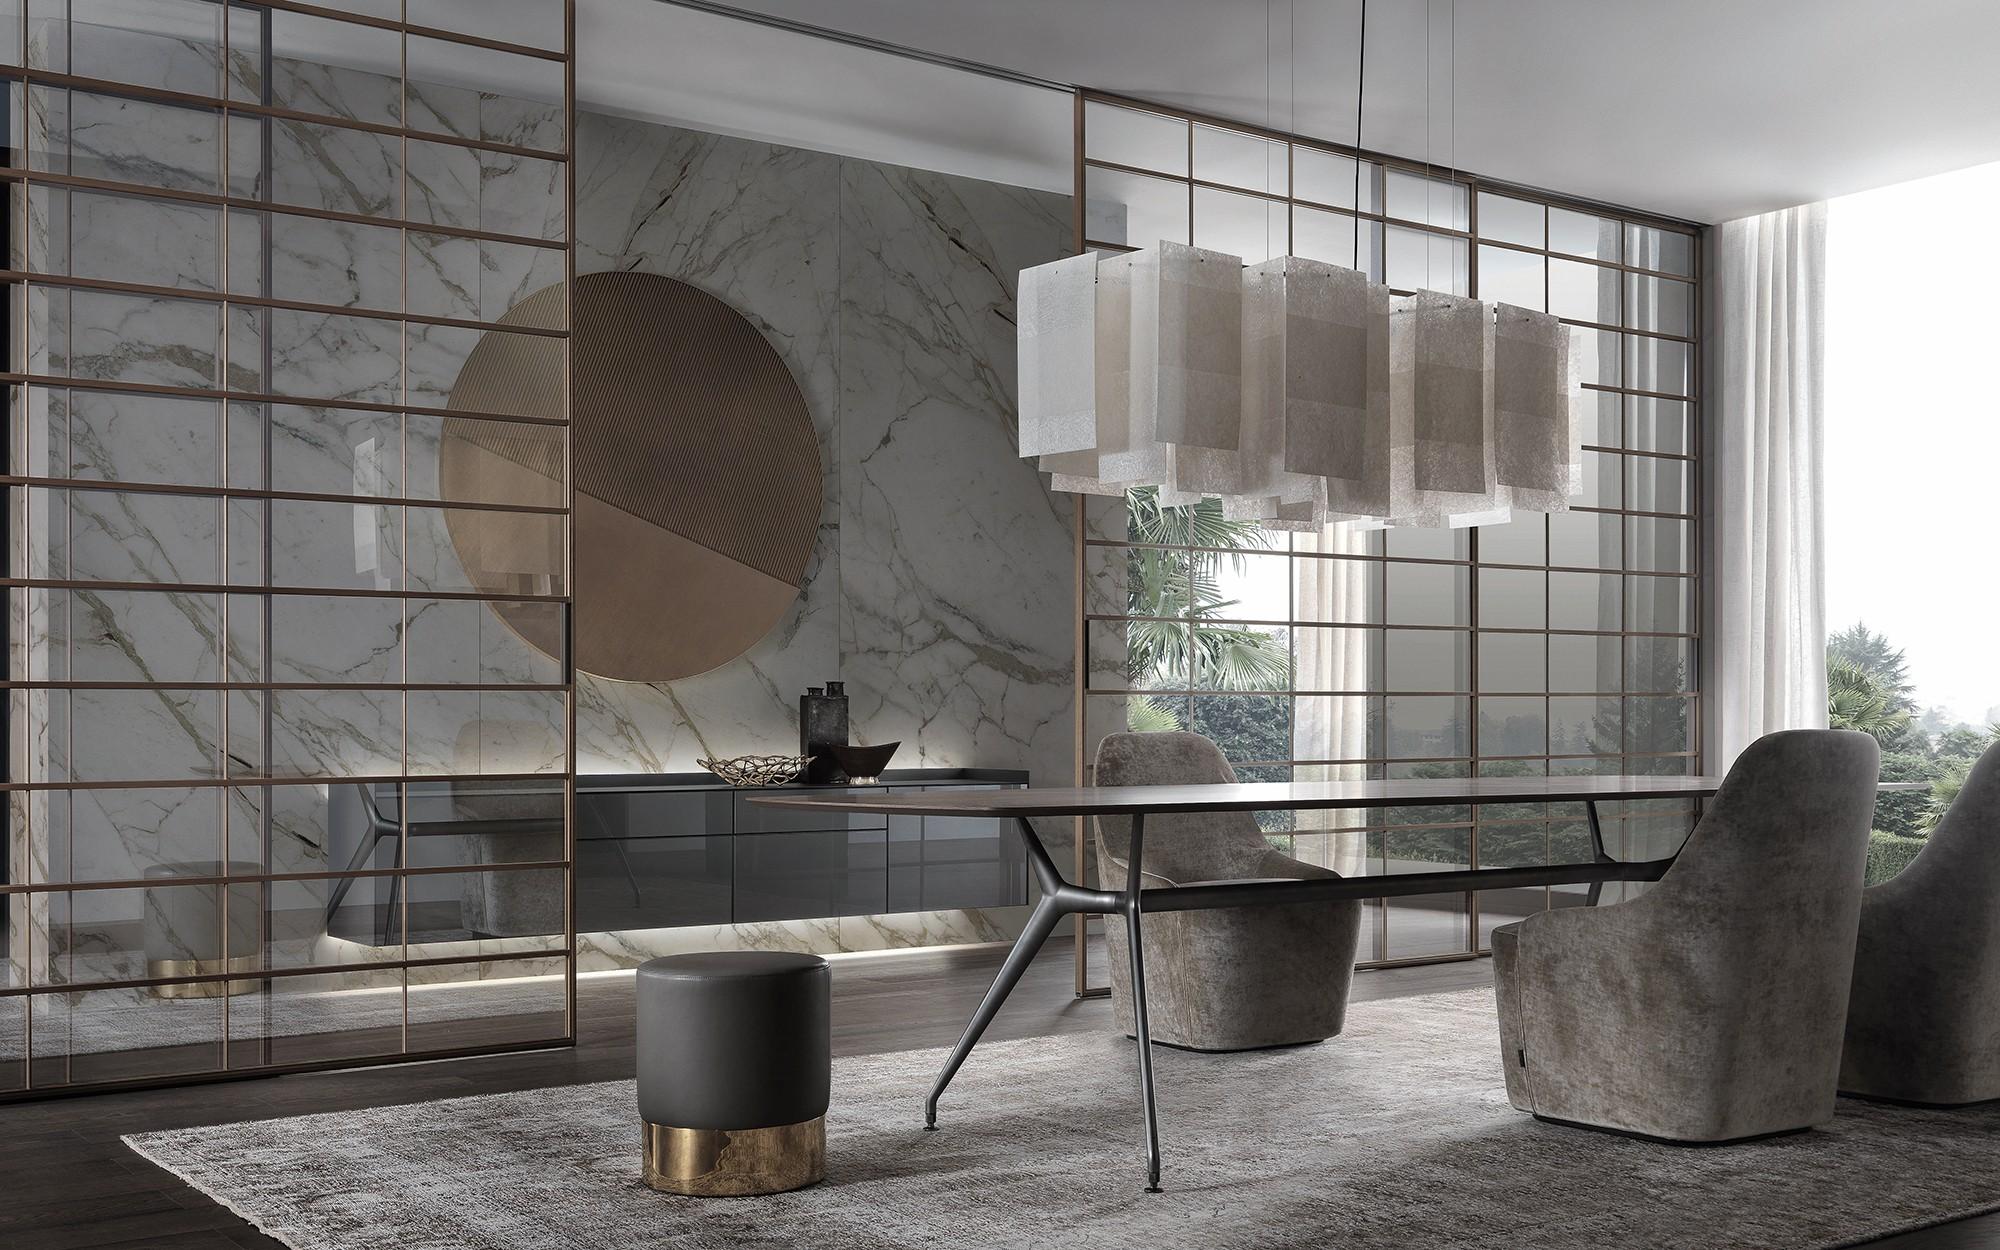 rimadesio soho sliding doors buy from campbell watson uk. Black Bedroom Furniture Sets. Home Design Ideas